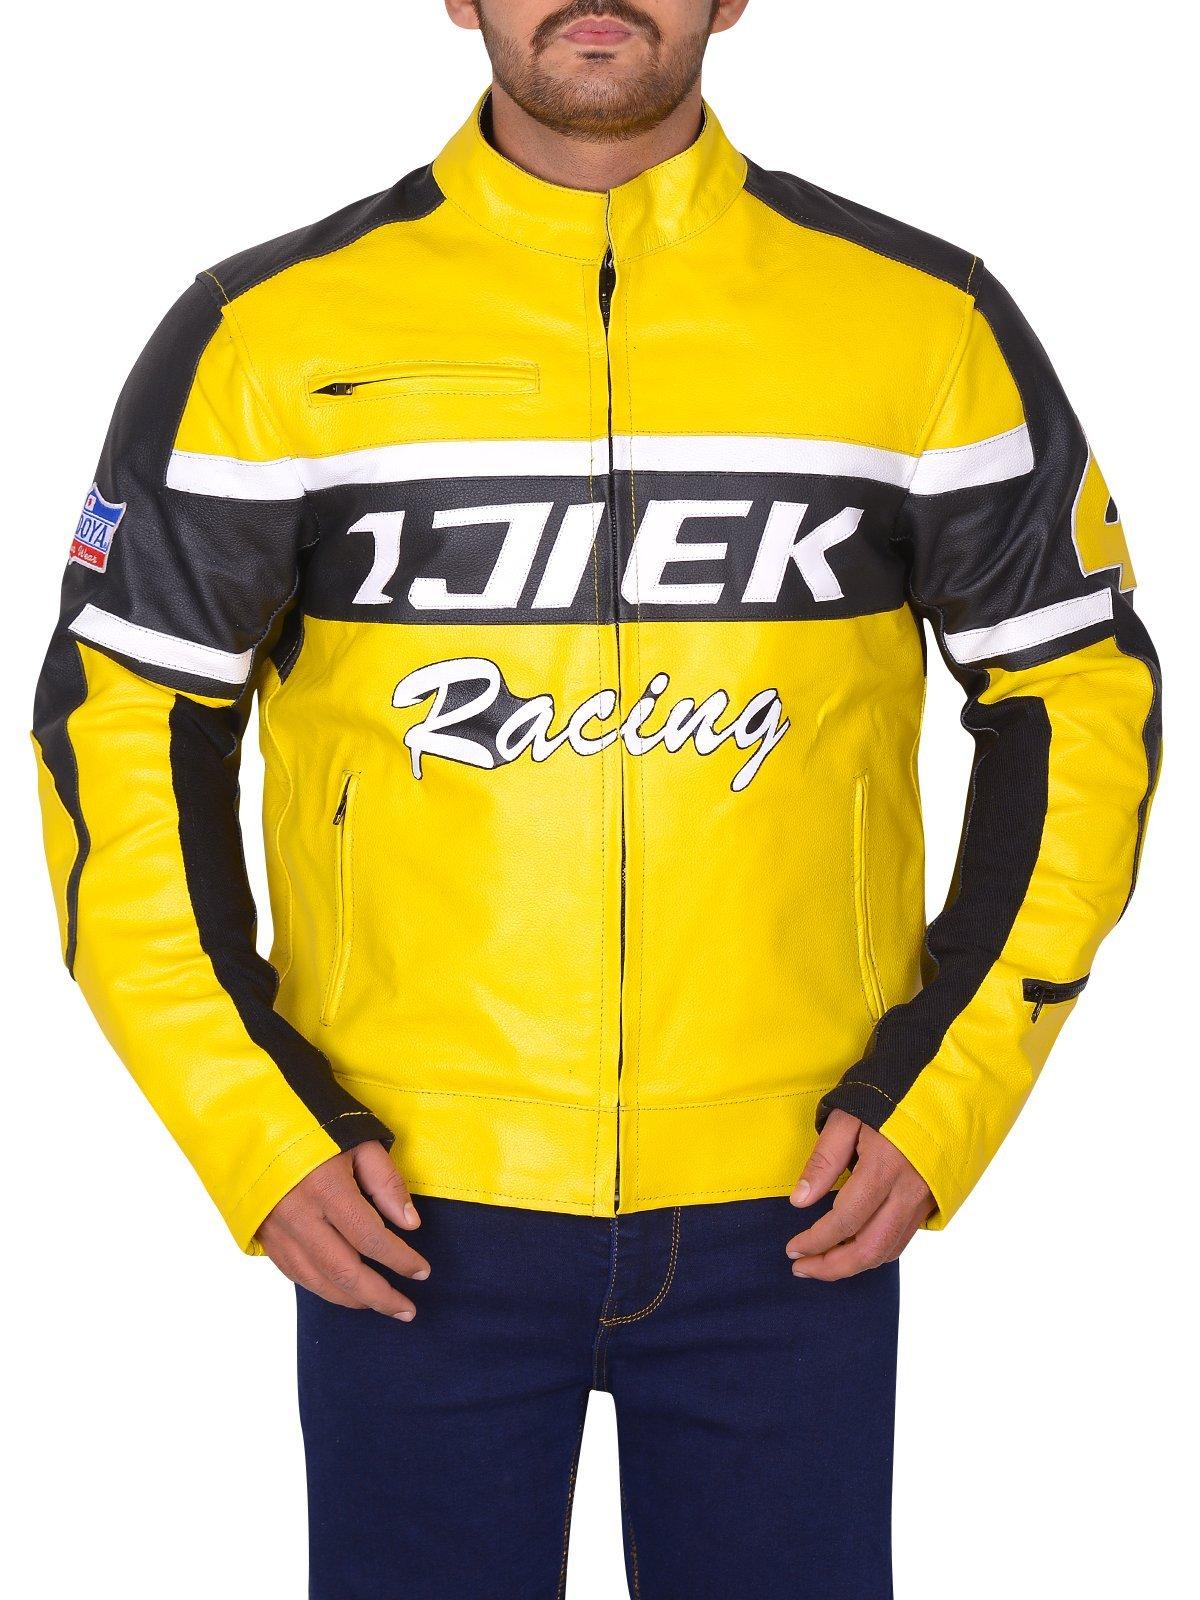 Dead Rising 2 Jacket Chuck Greene Leather Jacket